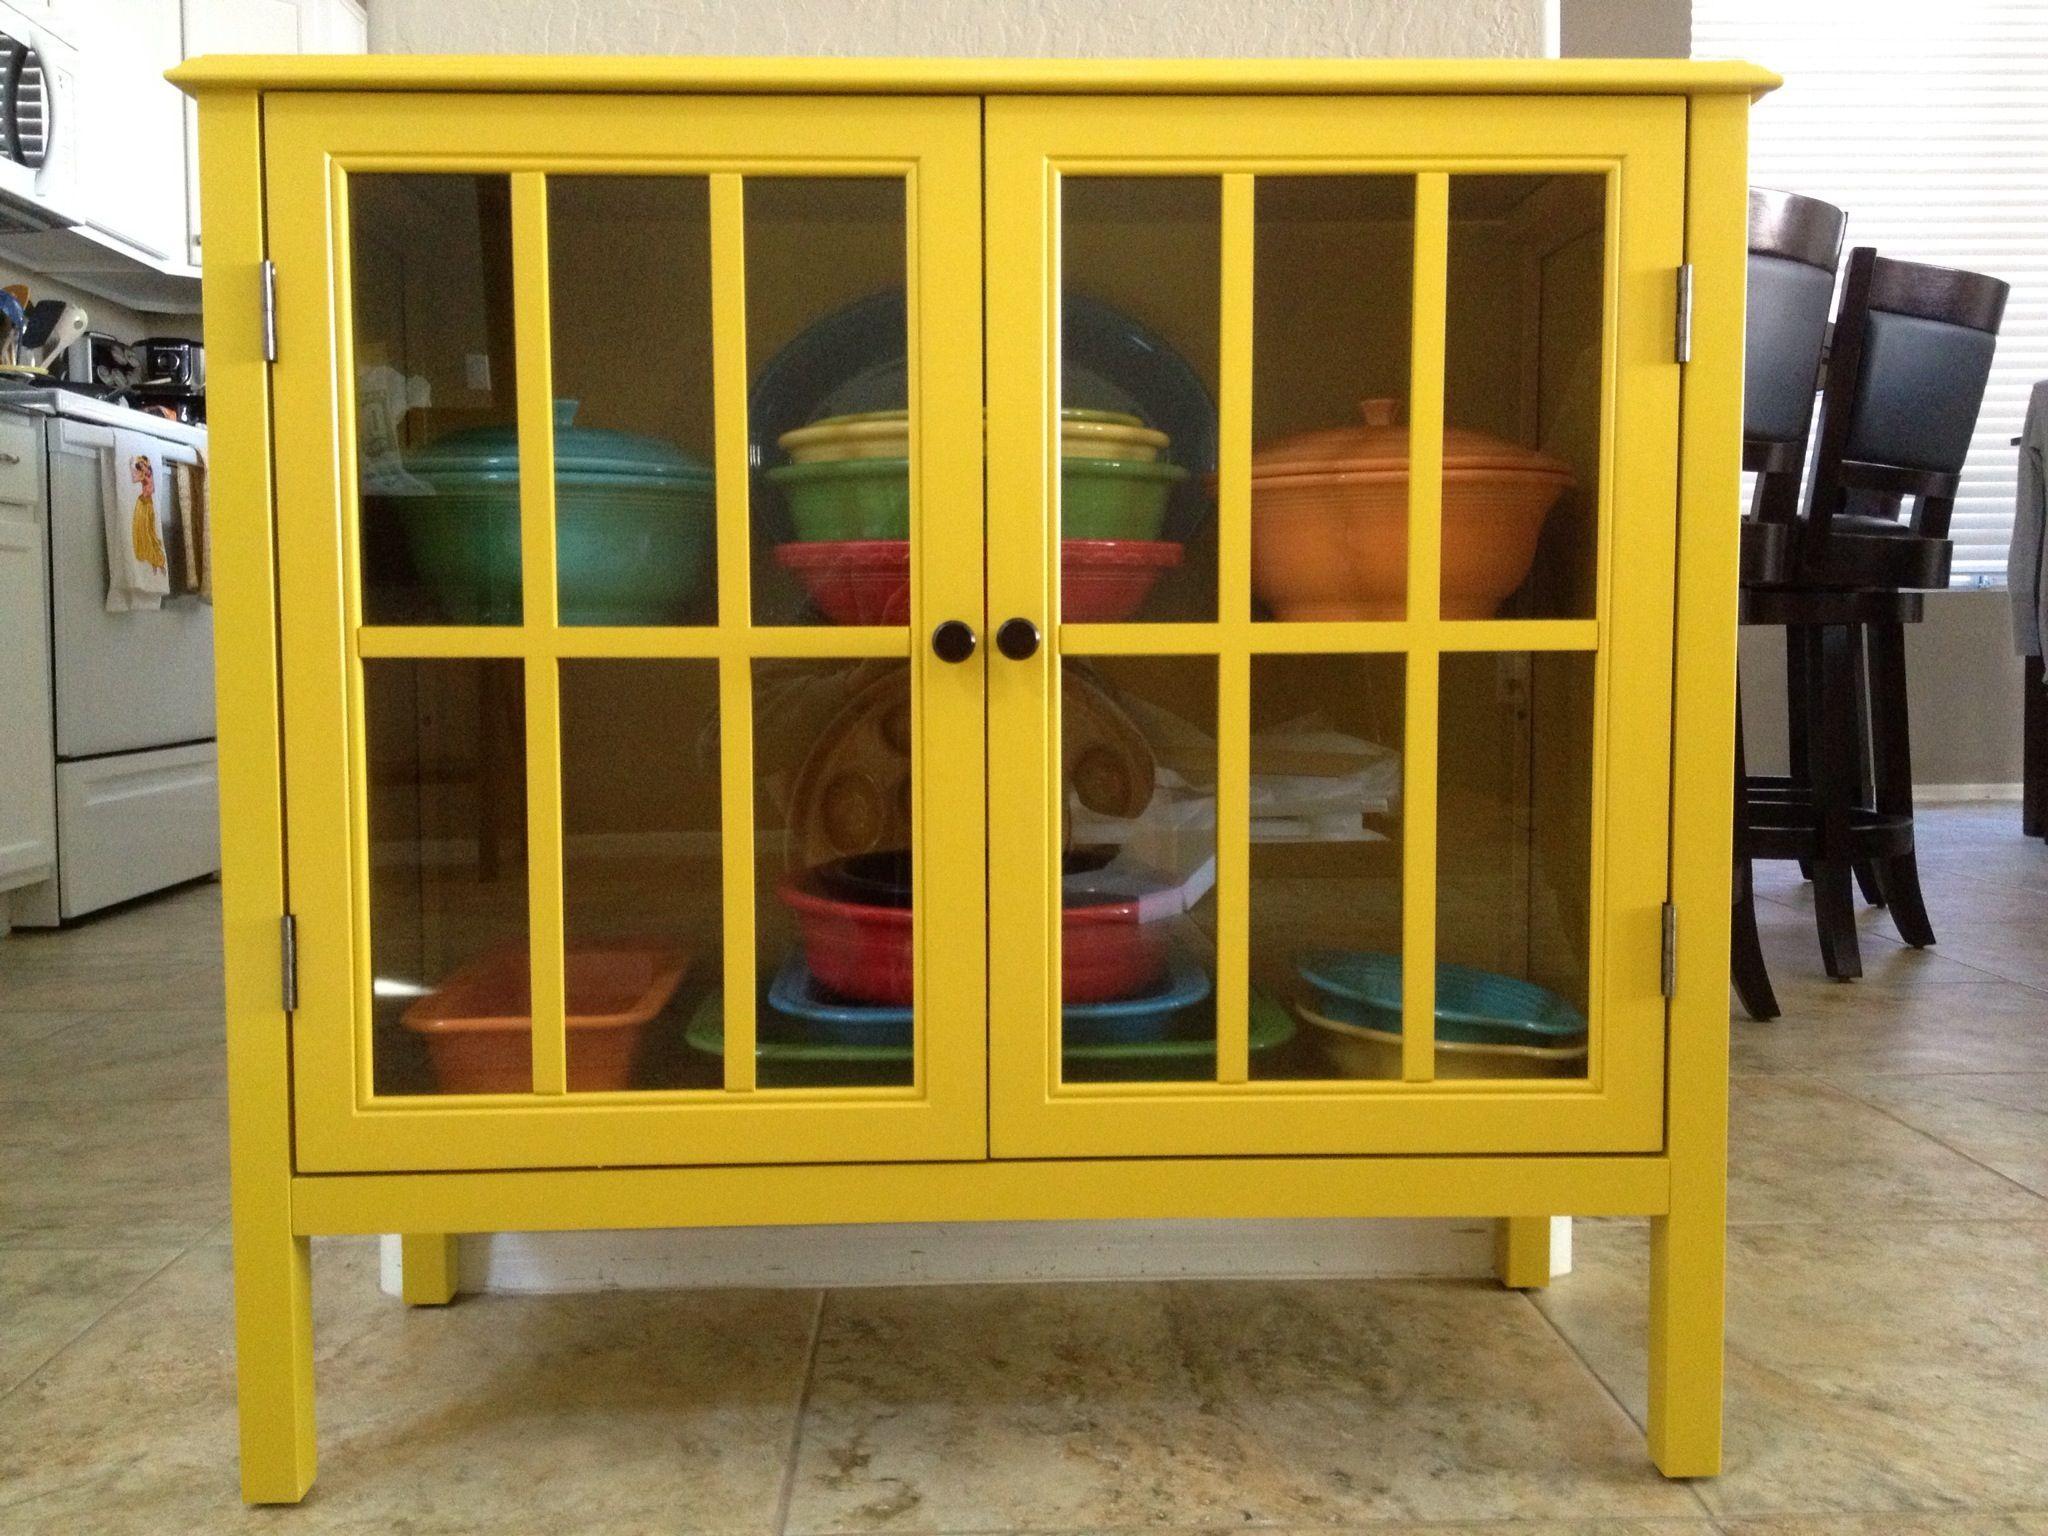 Fiestaware Looks Like Target Threshold Bookcase Fiestaware